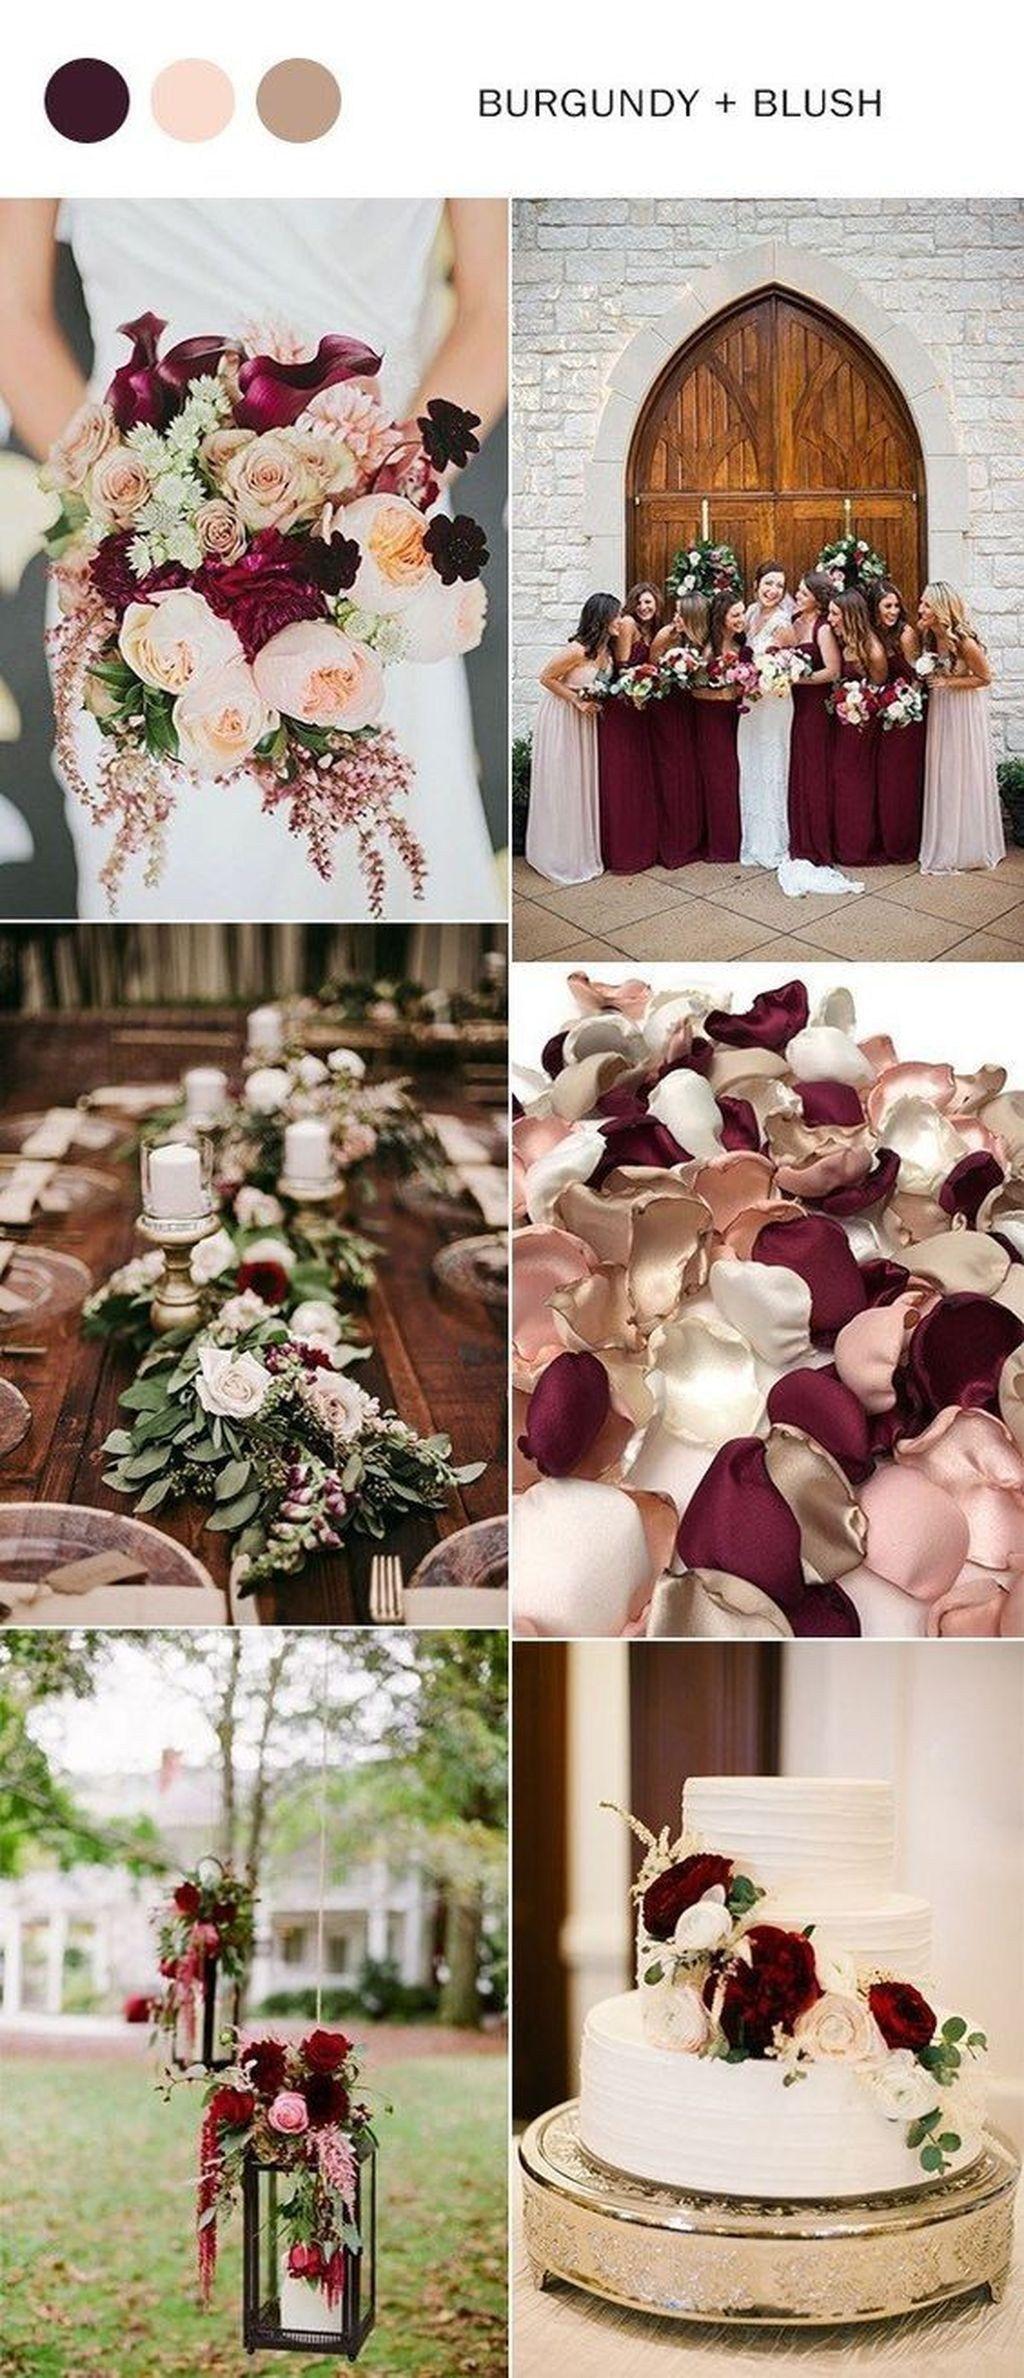 49 unique color combinations ideas for winter weddings